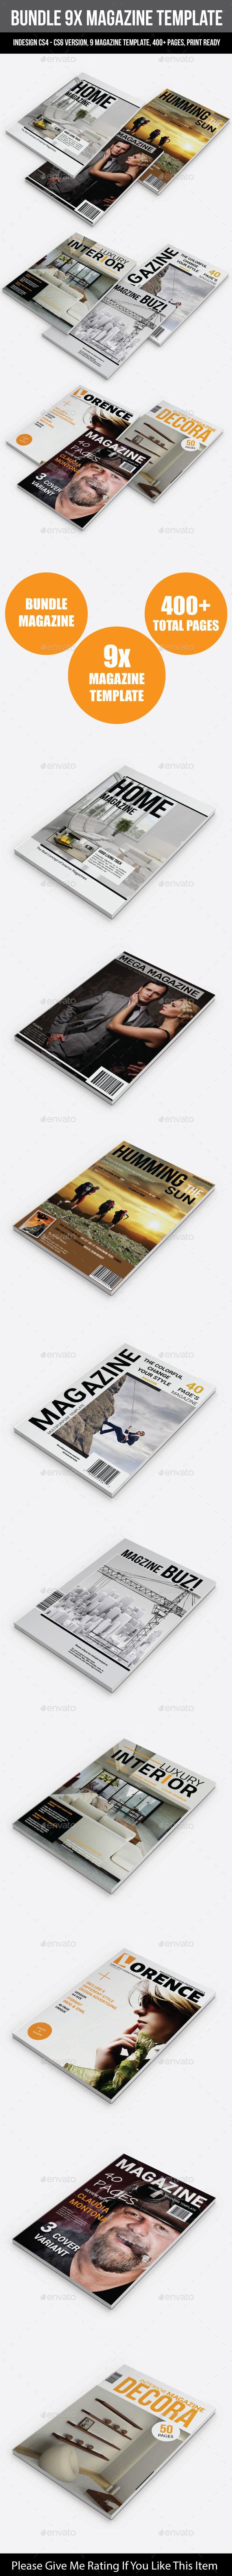 Bundle 9X Magazine Template - Magazines Print Templates